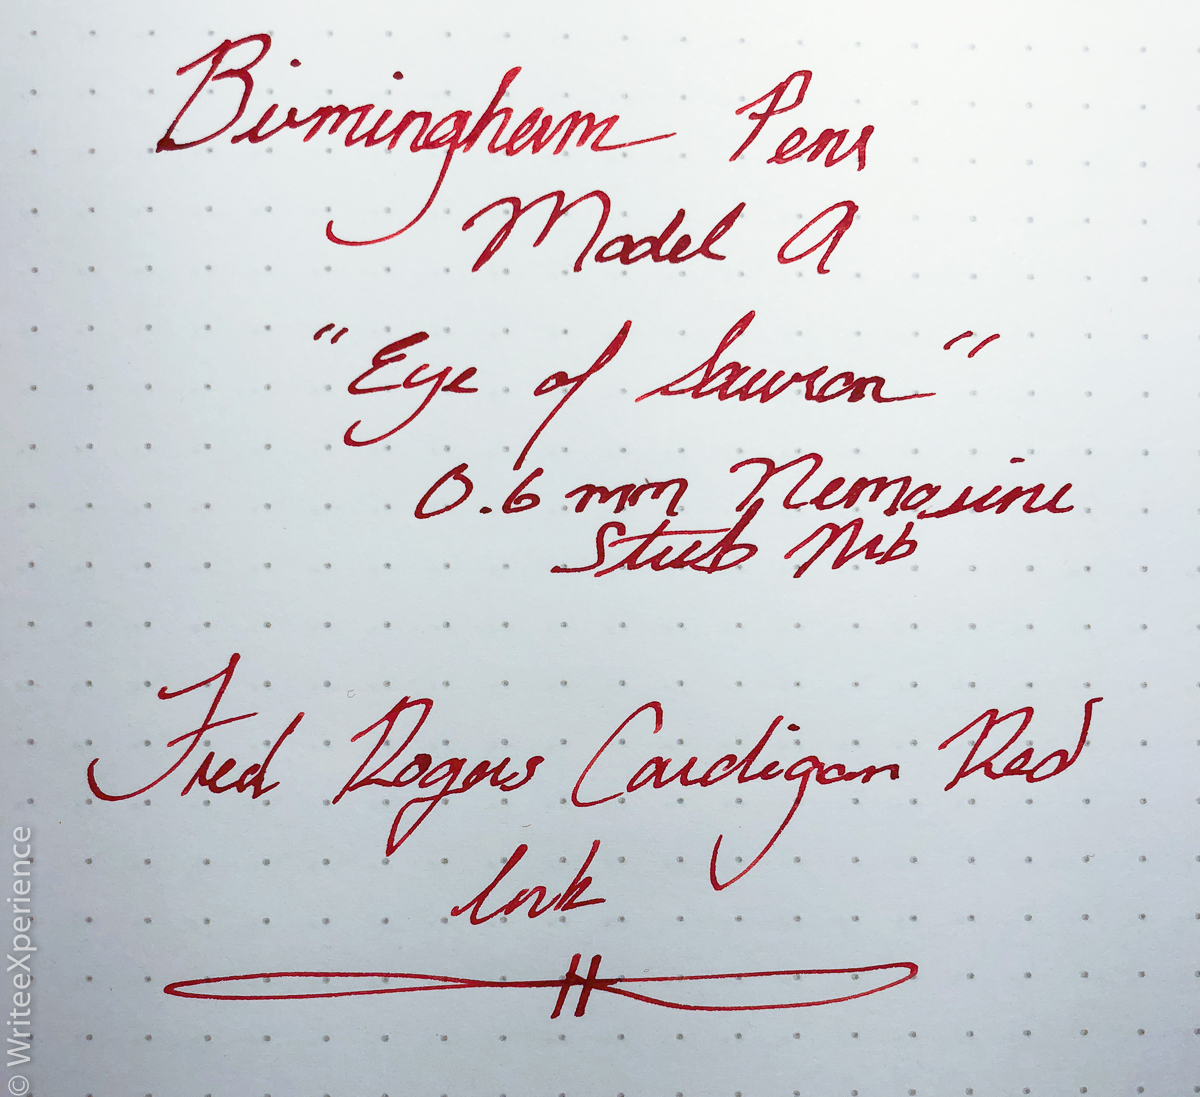 WriteeXperience-Birmingham_Pens_Model_A-9.jpg